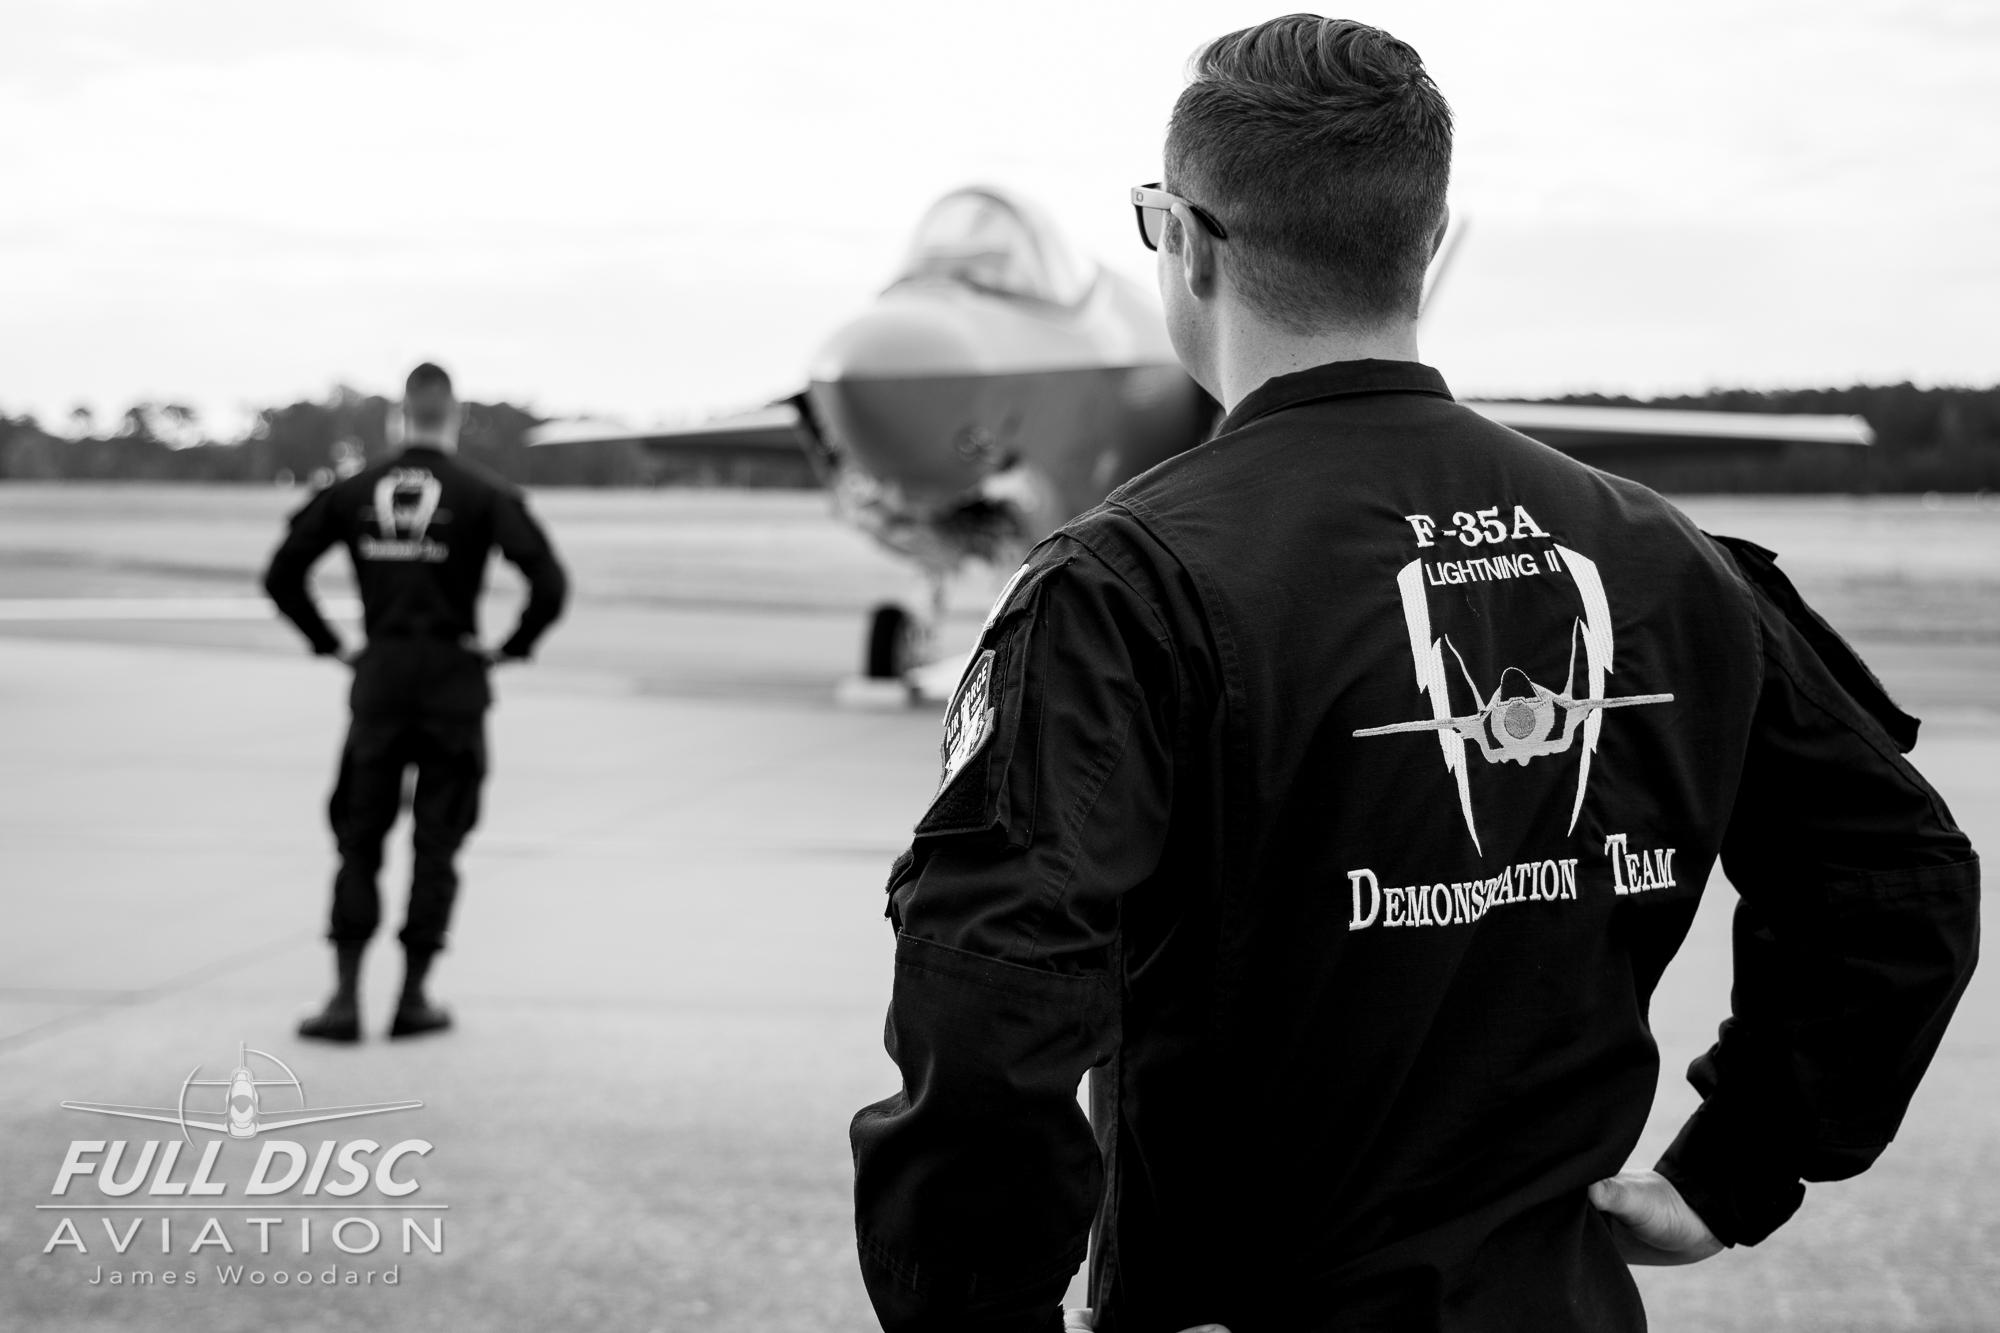 F35DemoTeam_FullDiscAviation_JamesWoodard-April 28, 2019-22.jpg